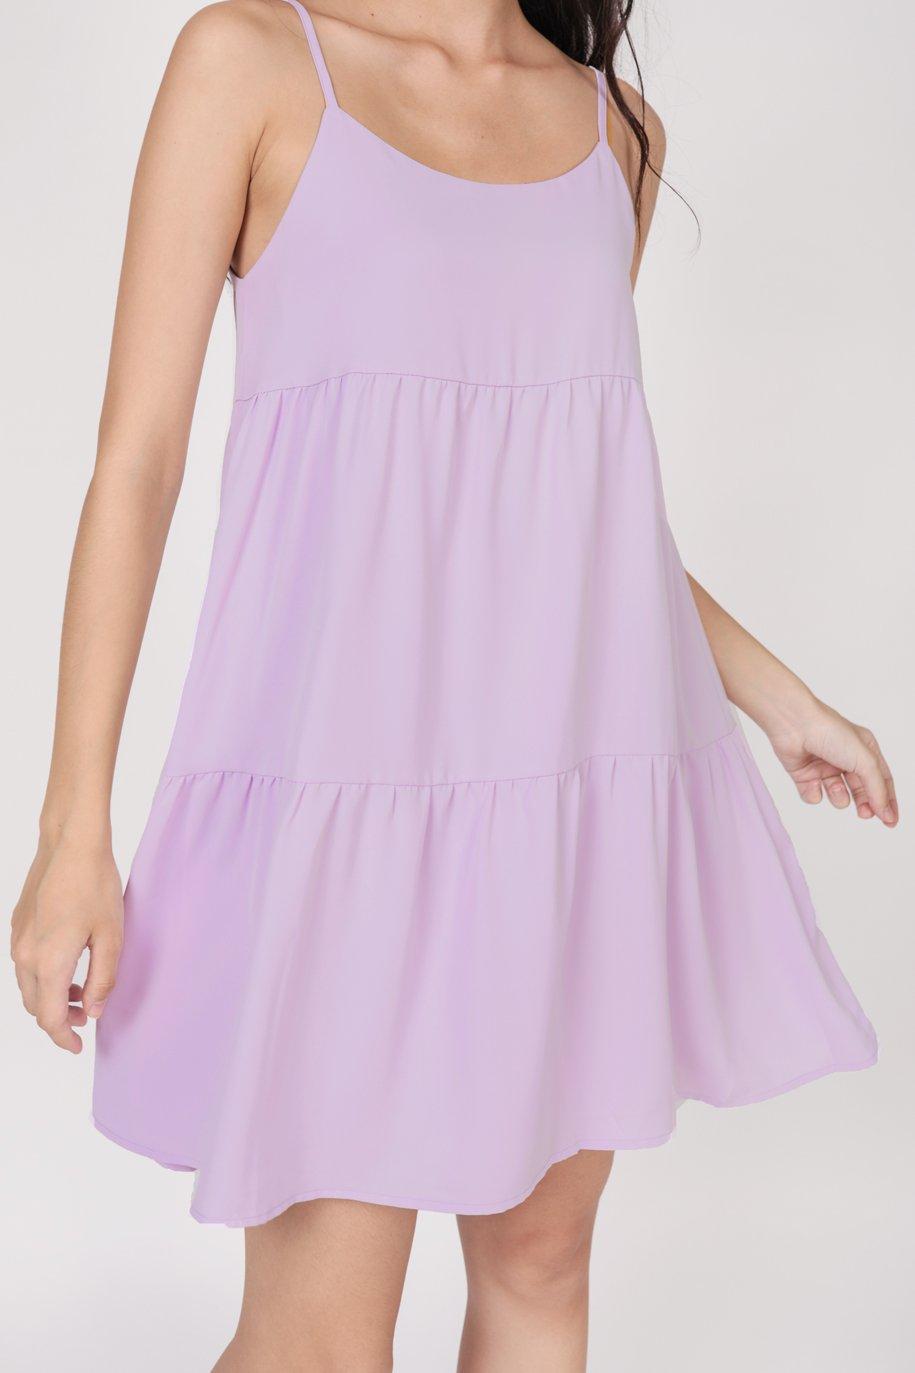 Emmy Tiered Spag Dress (Lilac)